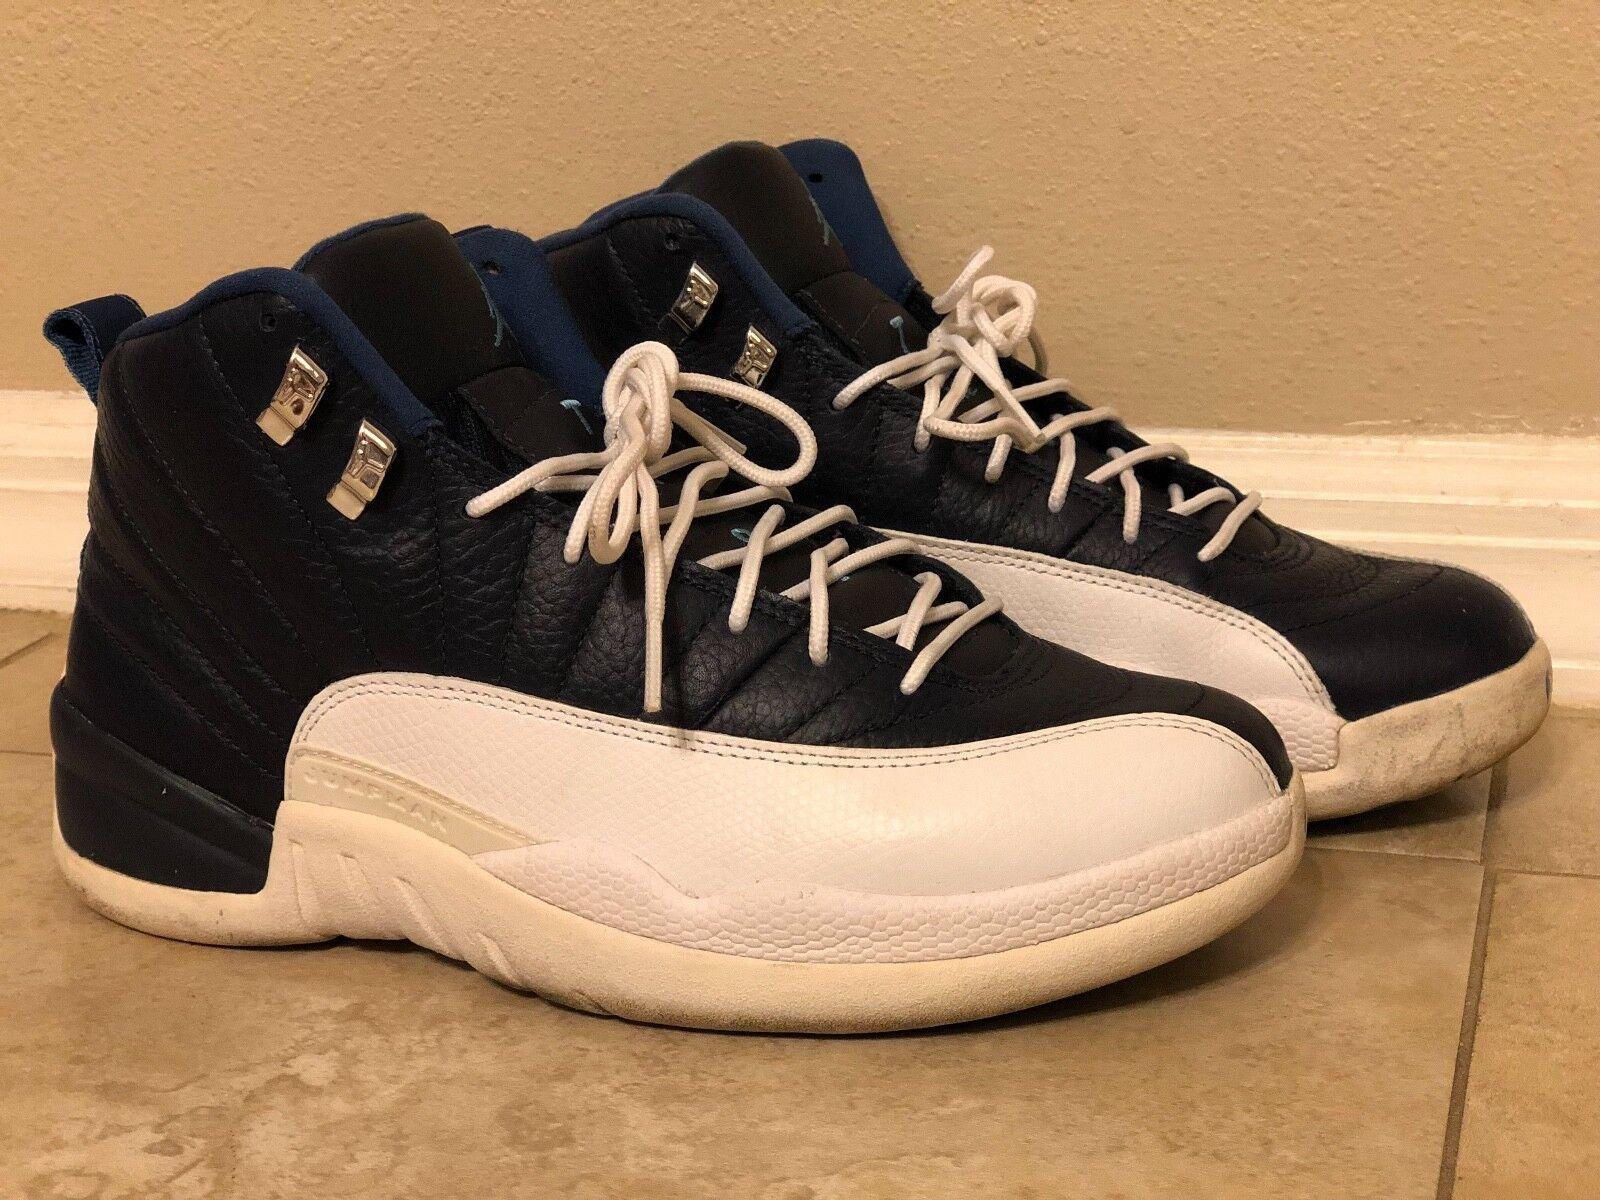 Jordan 12 azul marino y Air blancoo Tamaño 9